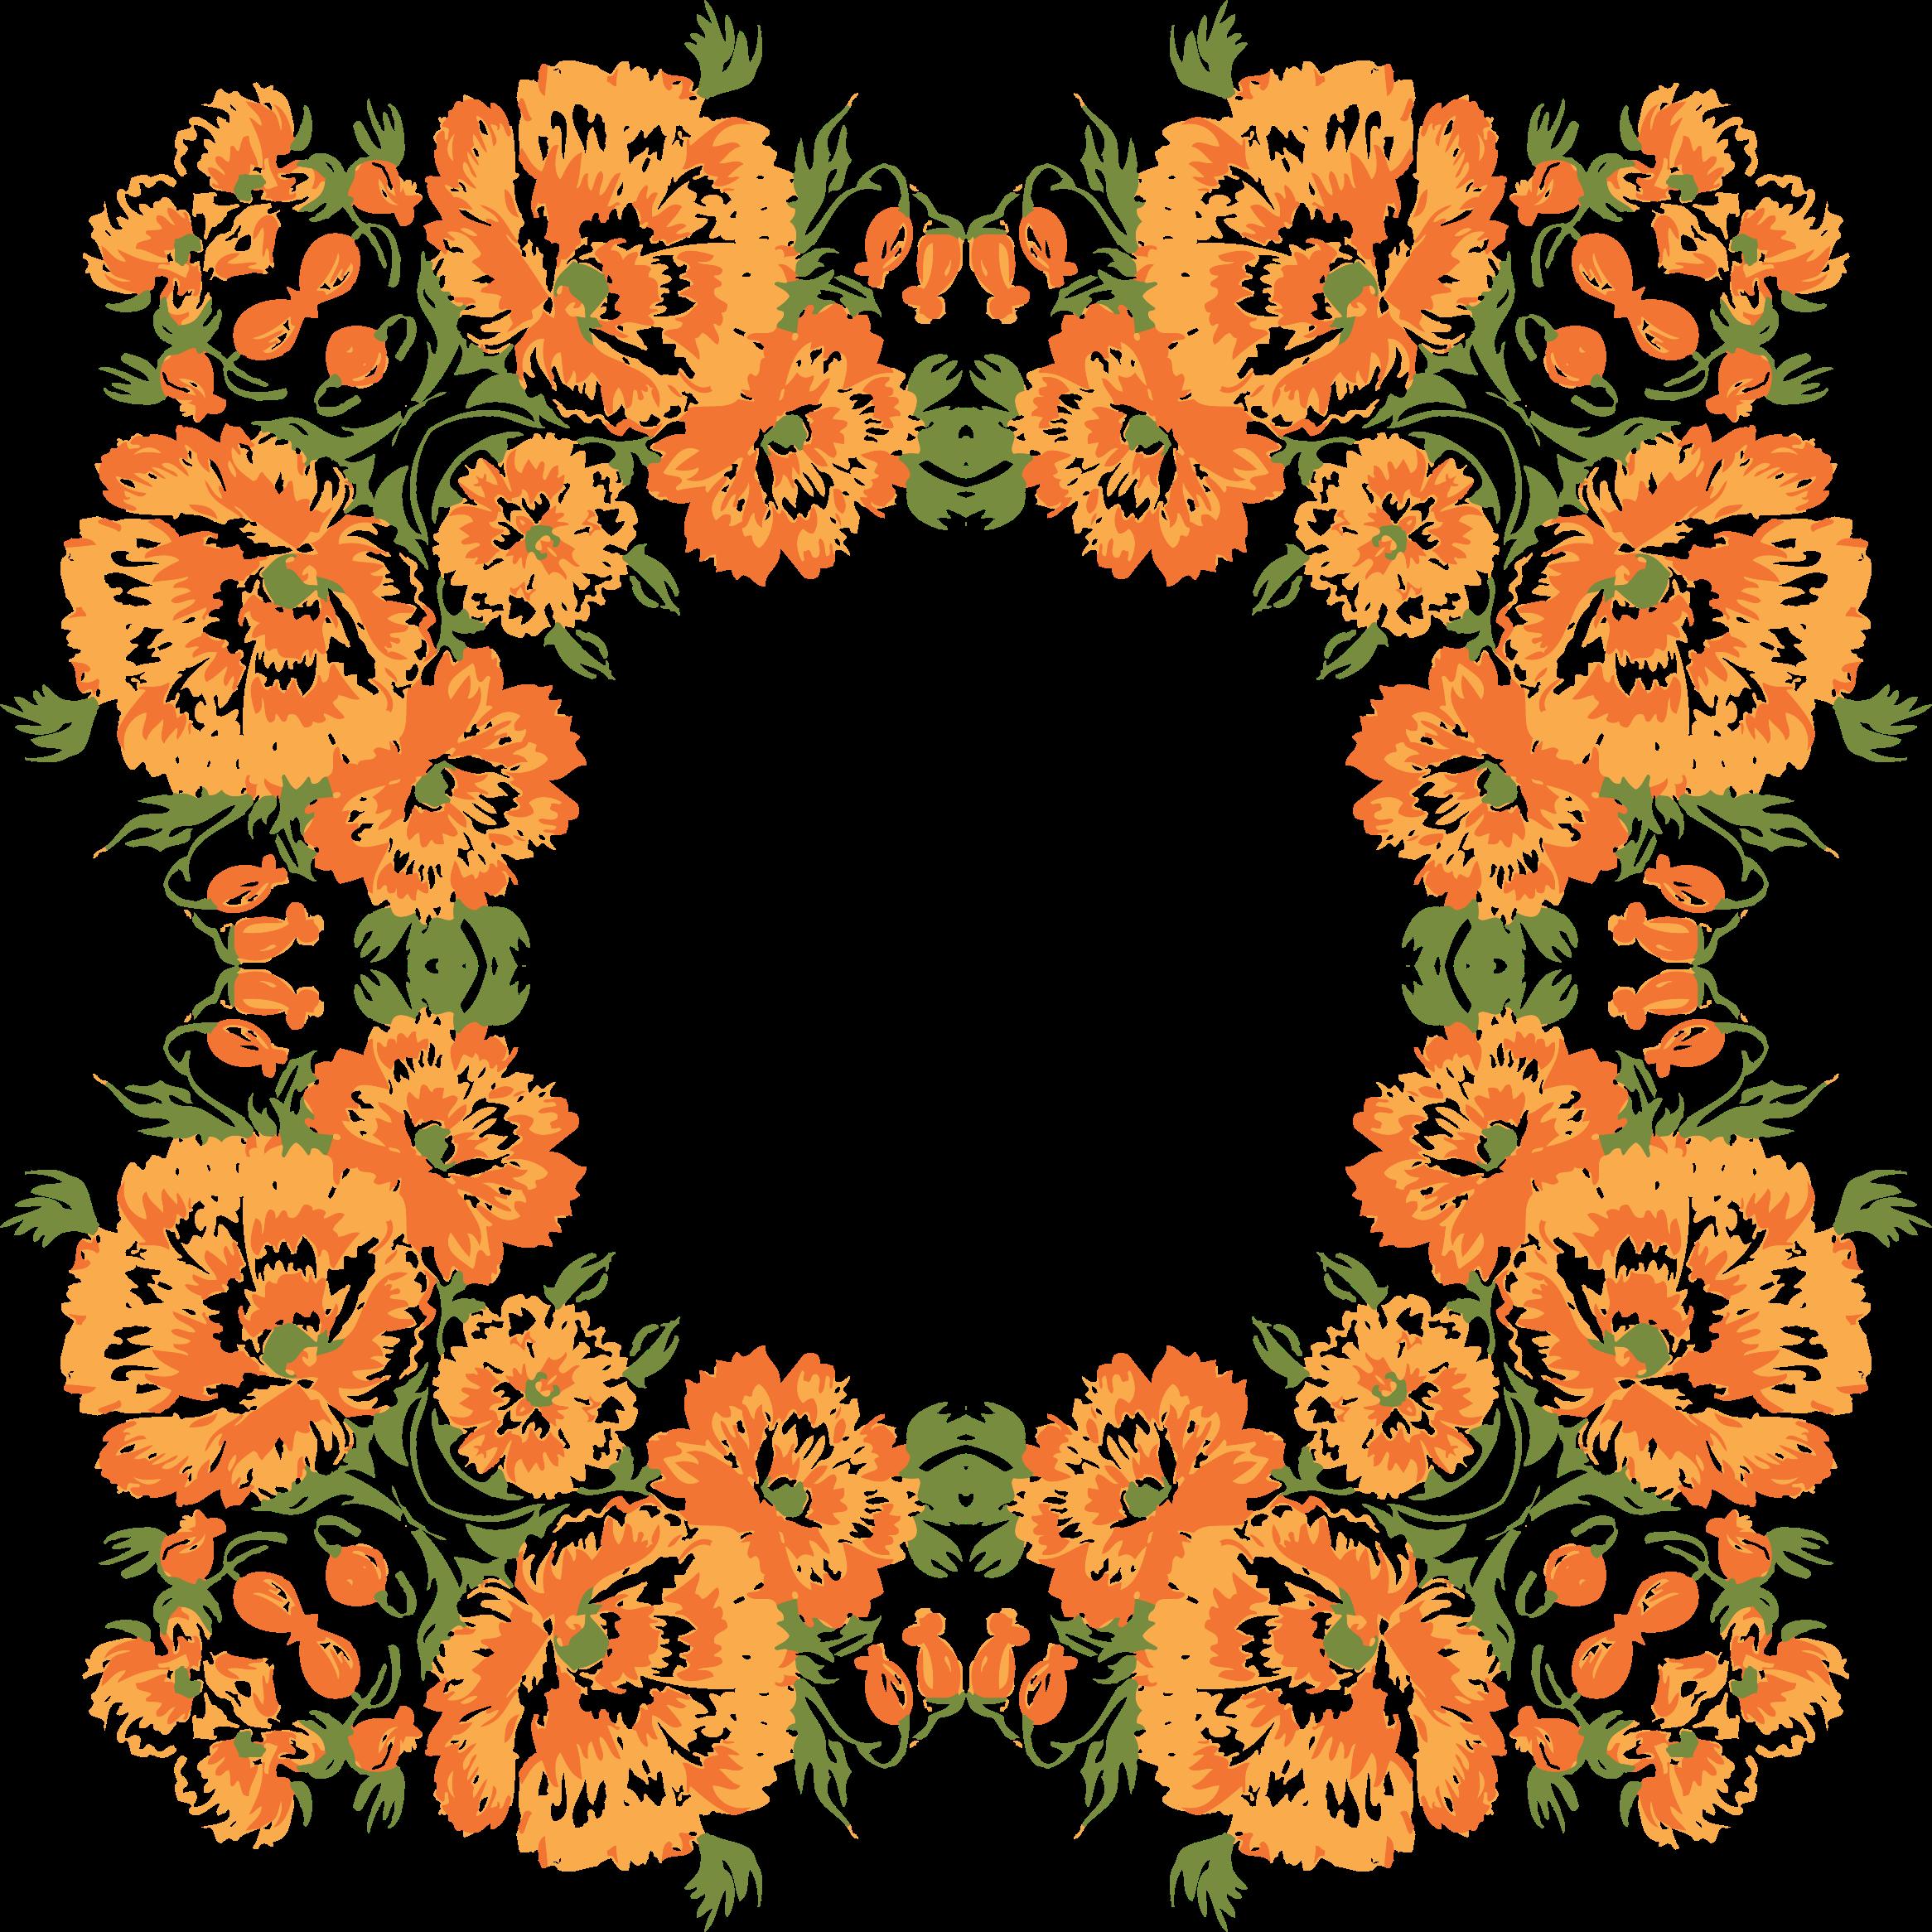 Floral clipart wreath. Frame big image png